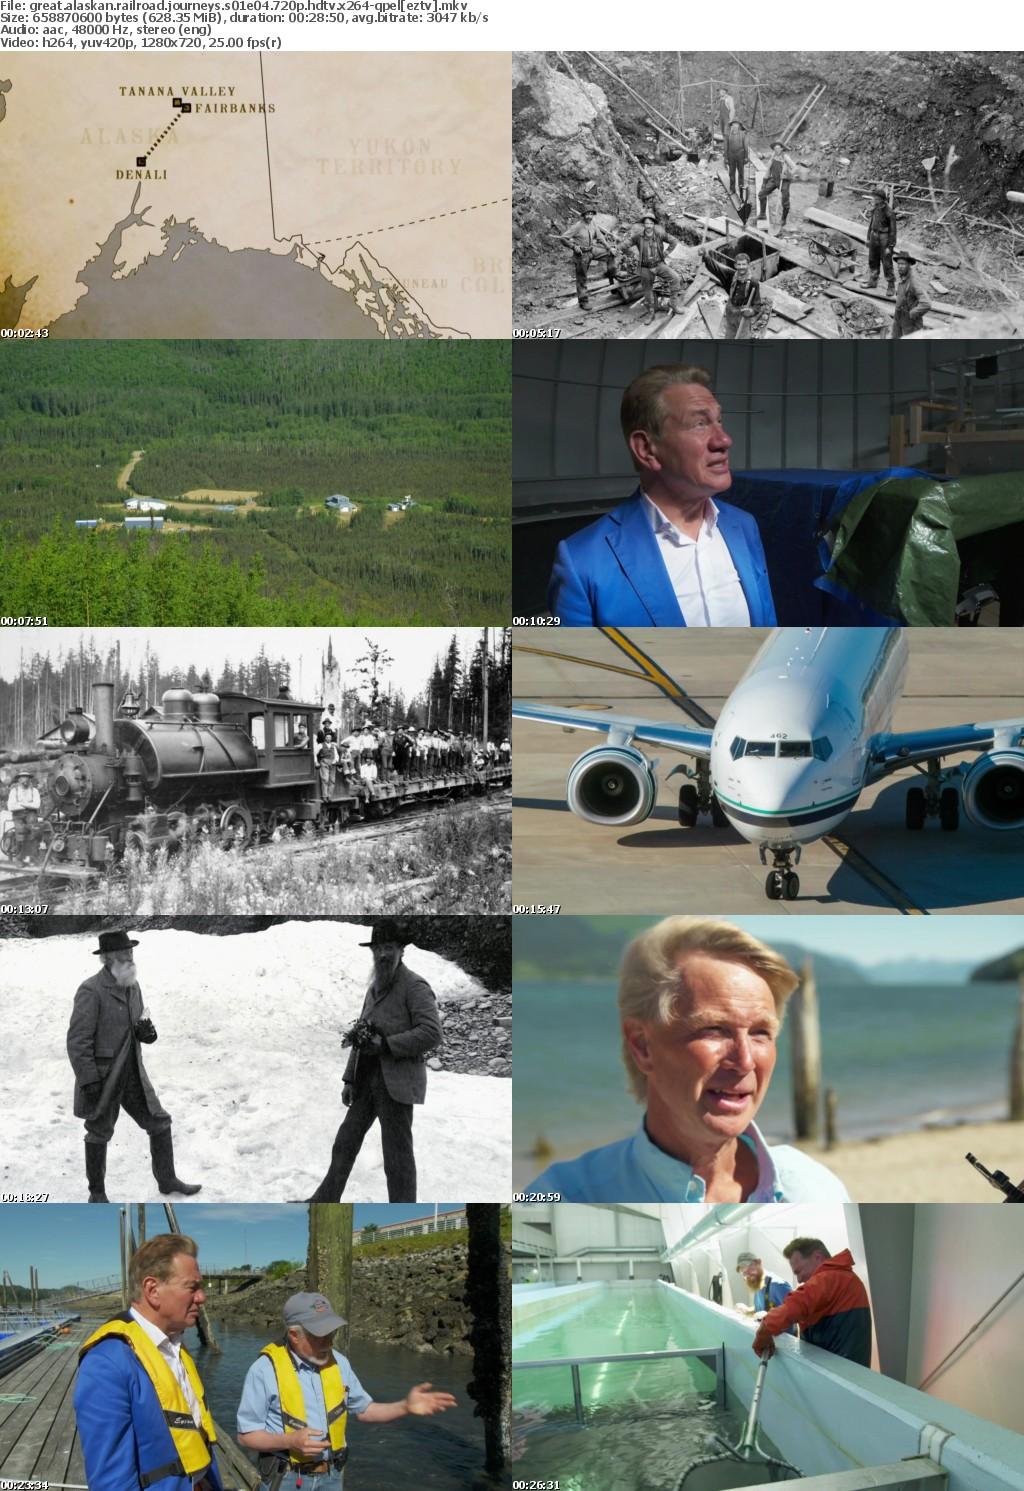 Great Alaskan Railroad Journeys S01E04 720p HDTV x264-QPEL